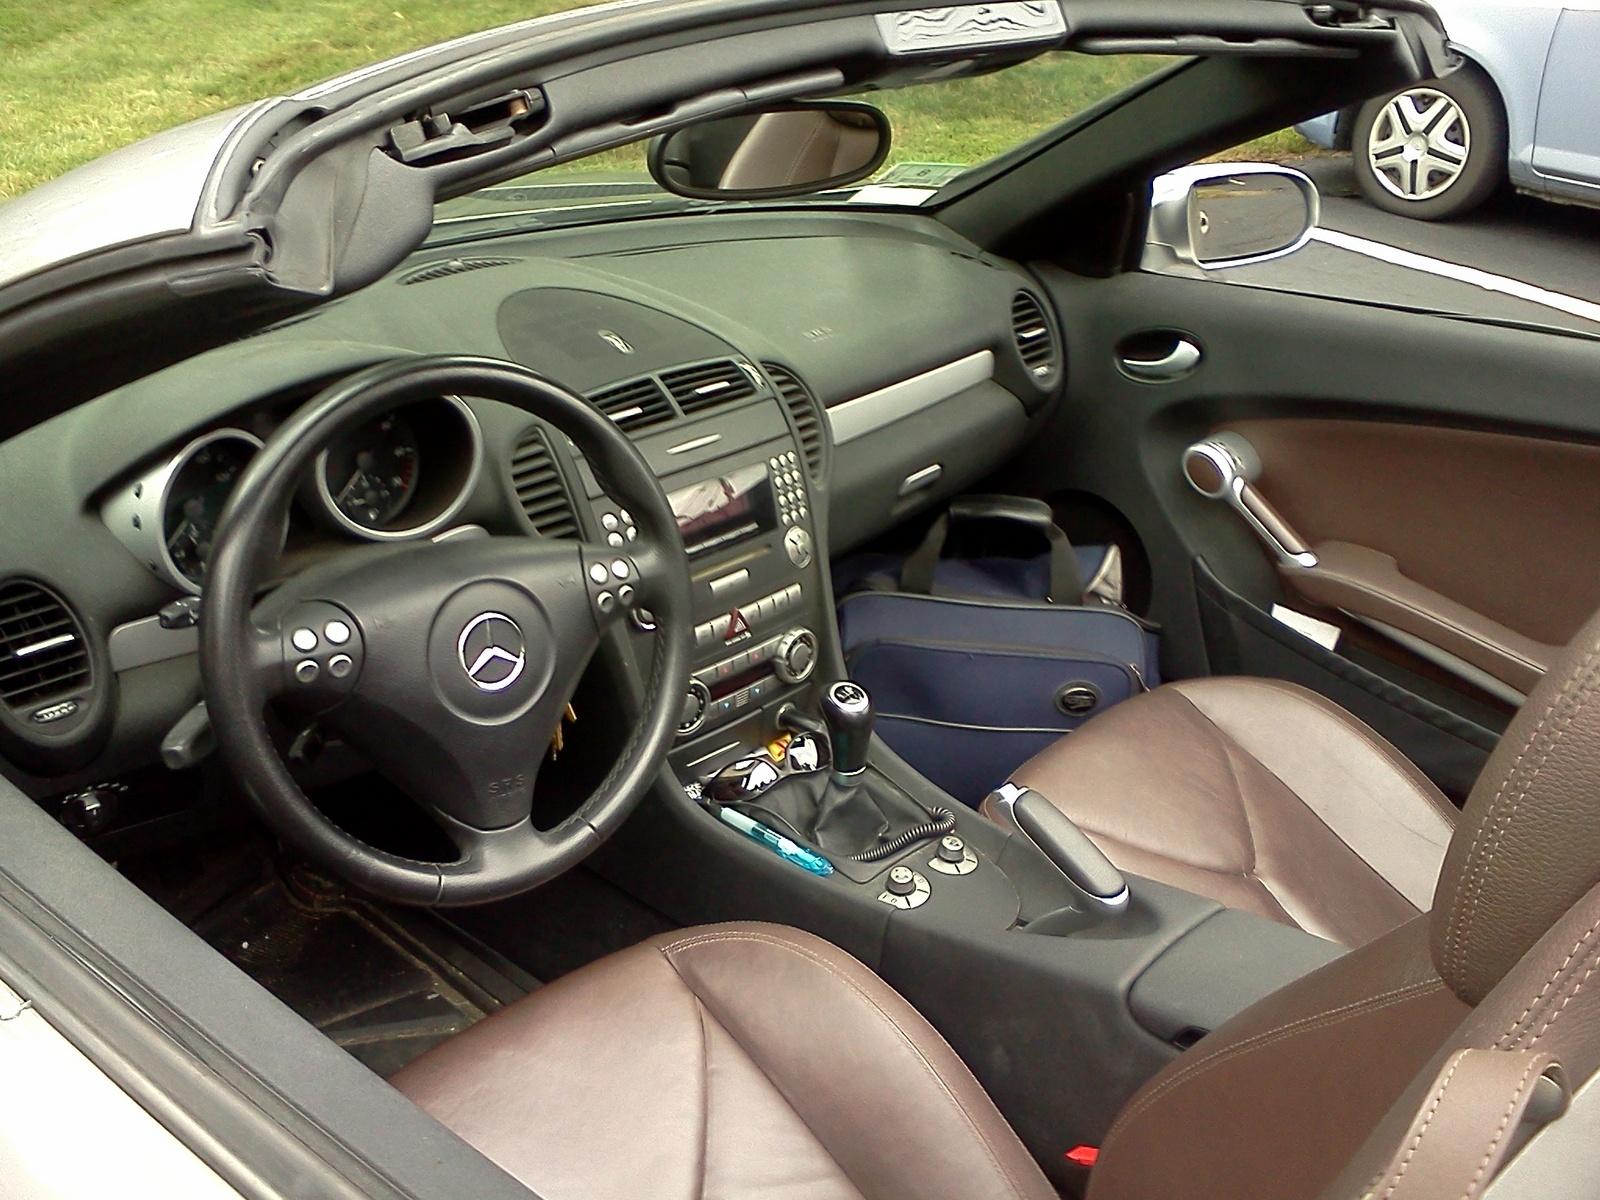 2005 Mercedes Benz Slk Class Interior Pictures Cargurus